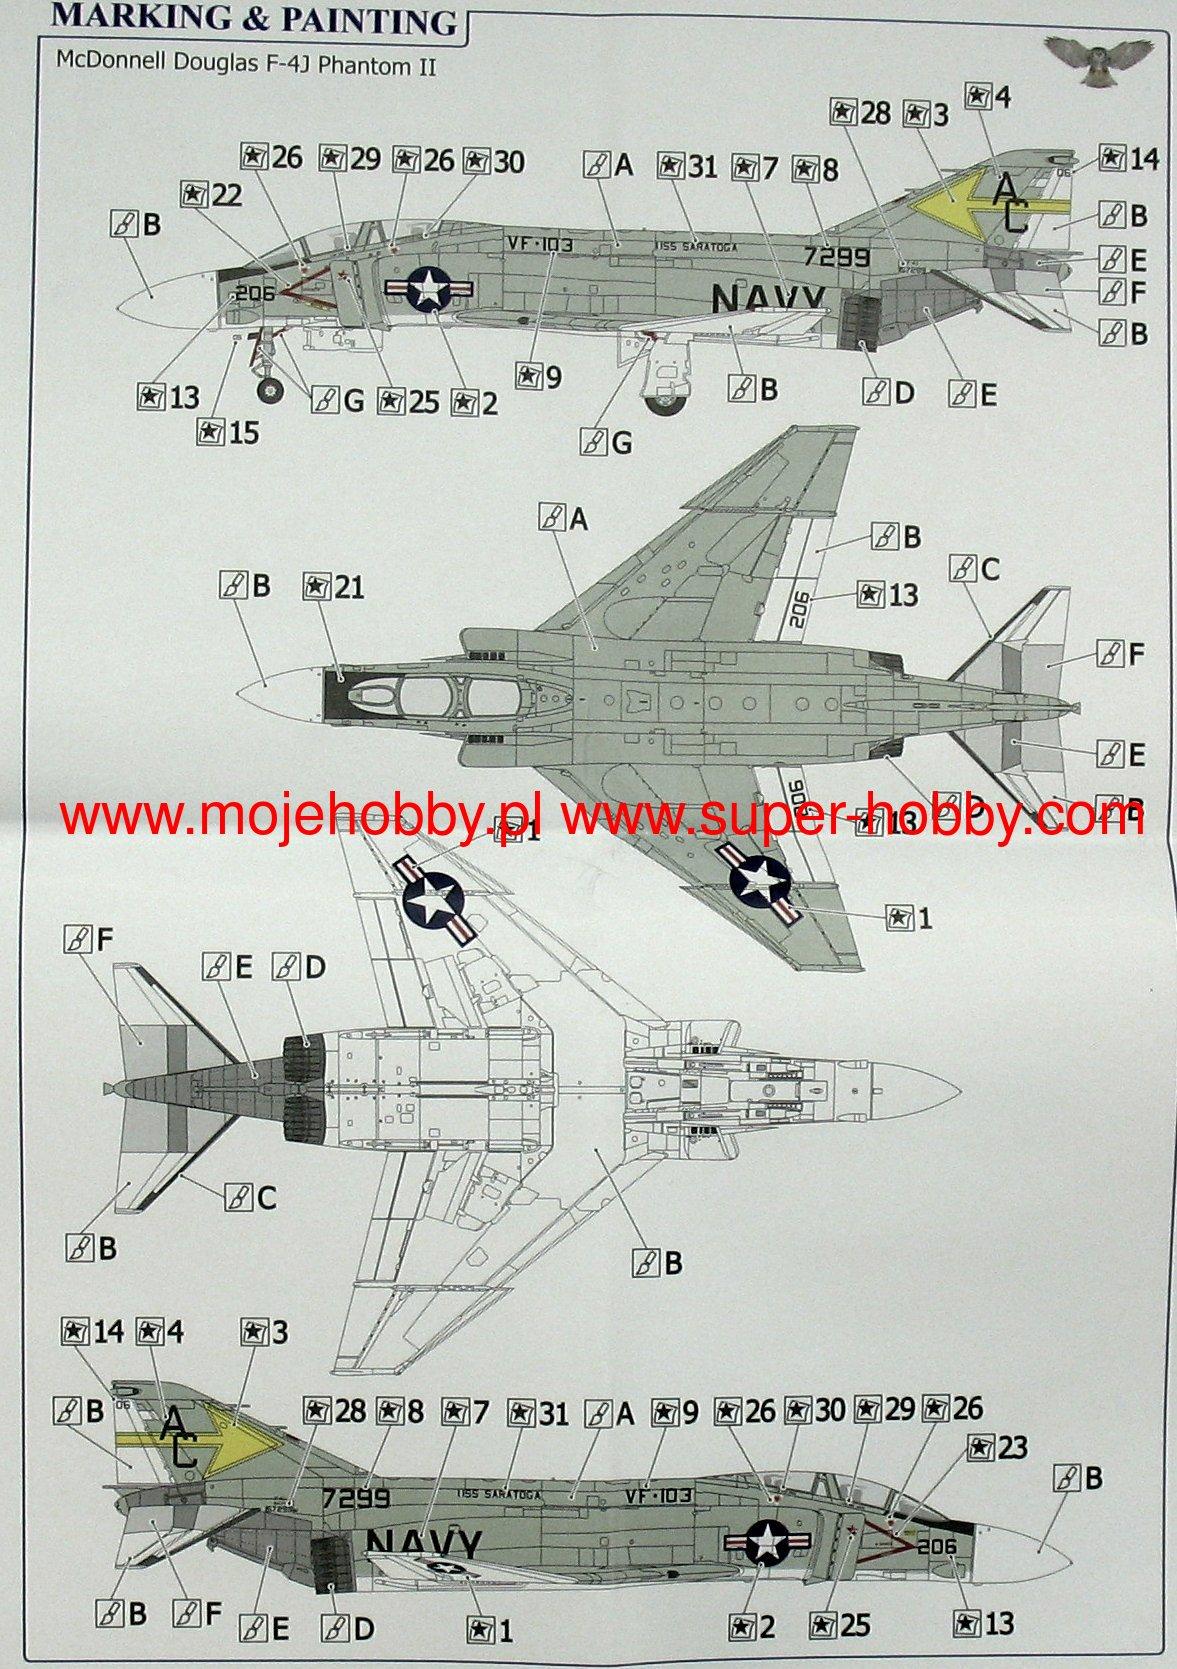 SOVA-M Models 1//144 MCDONNELL DOUGLAS F-4F PHANTOM II Jet Fighter